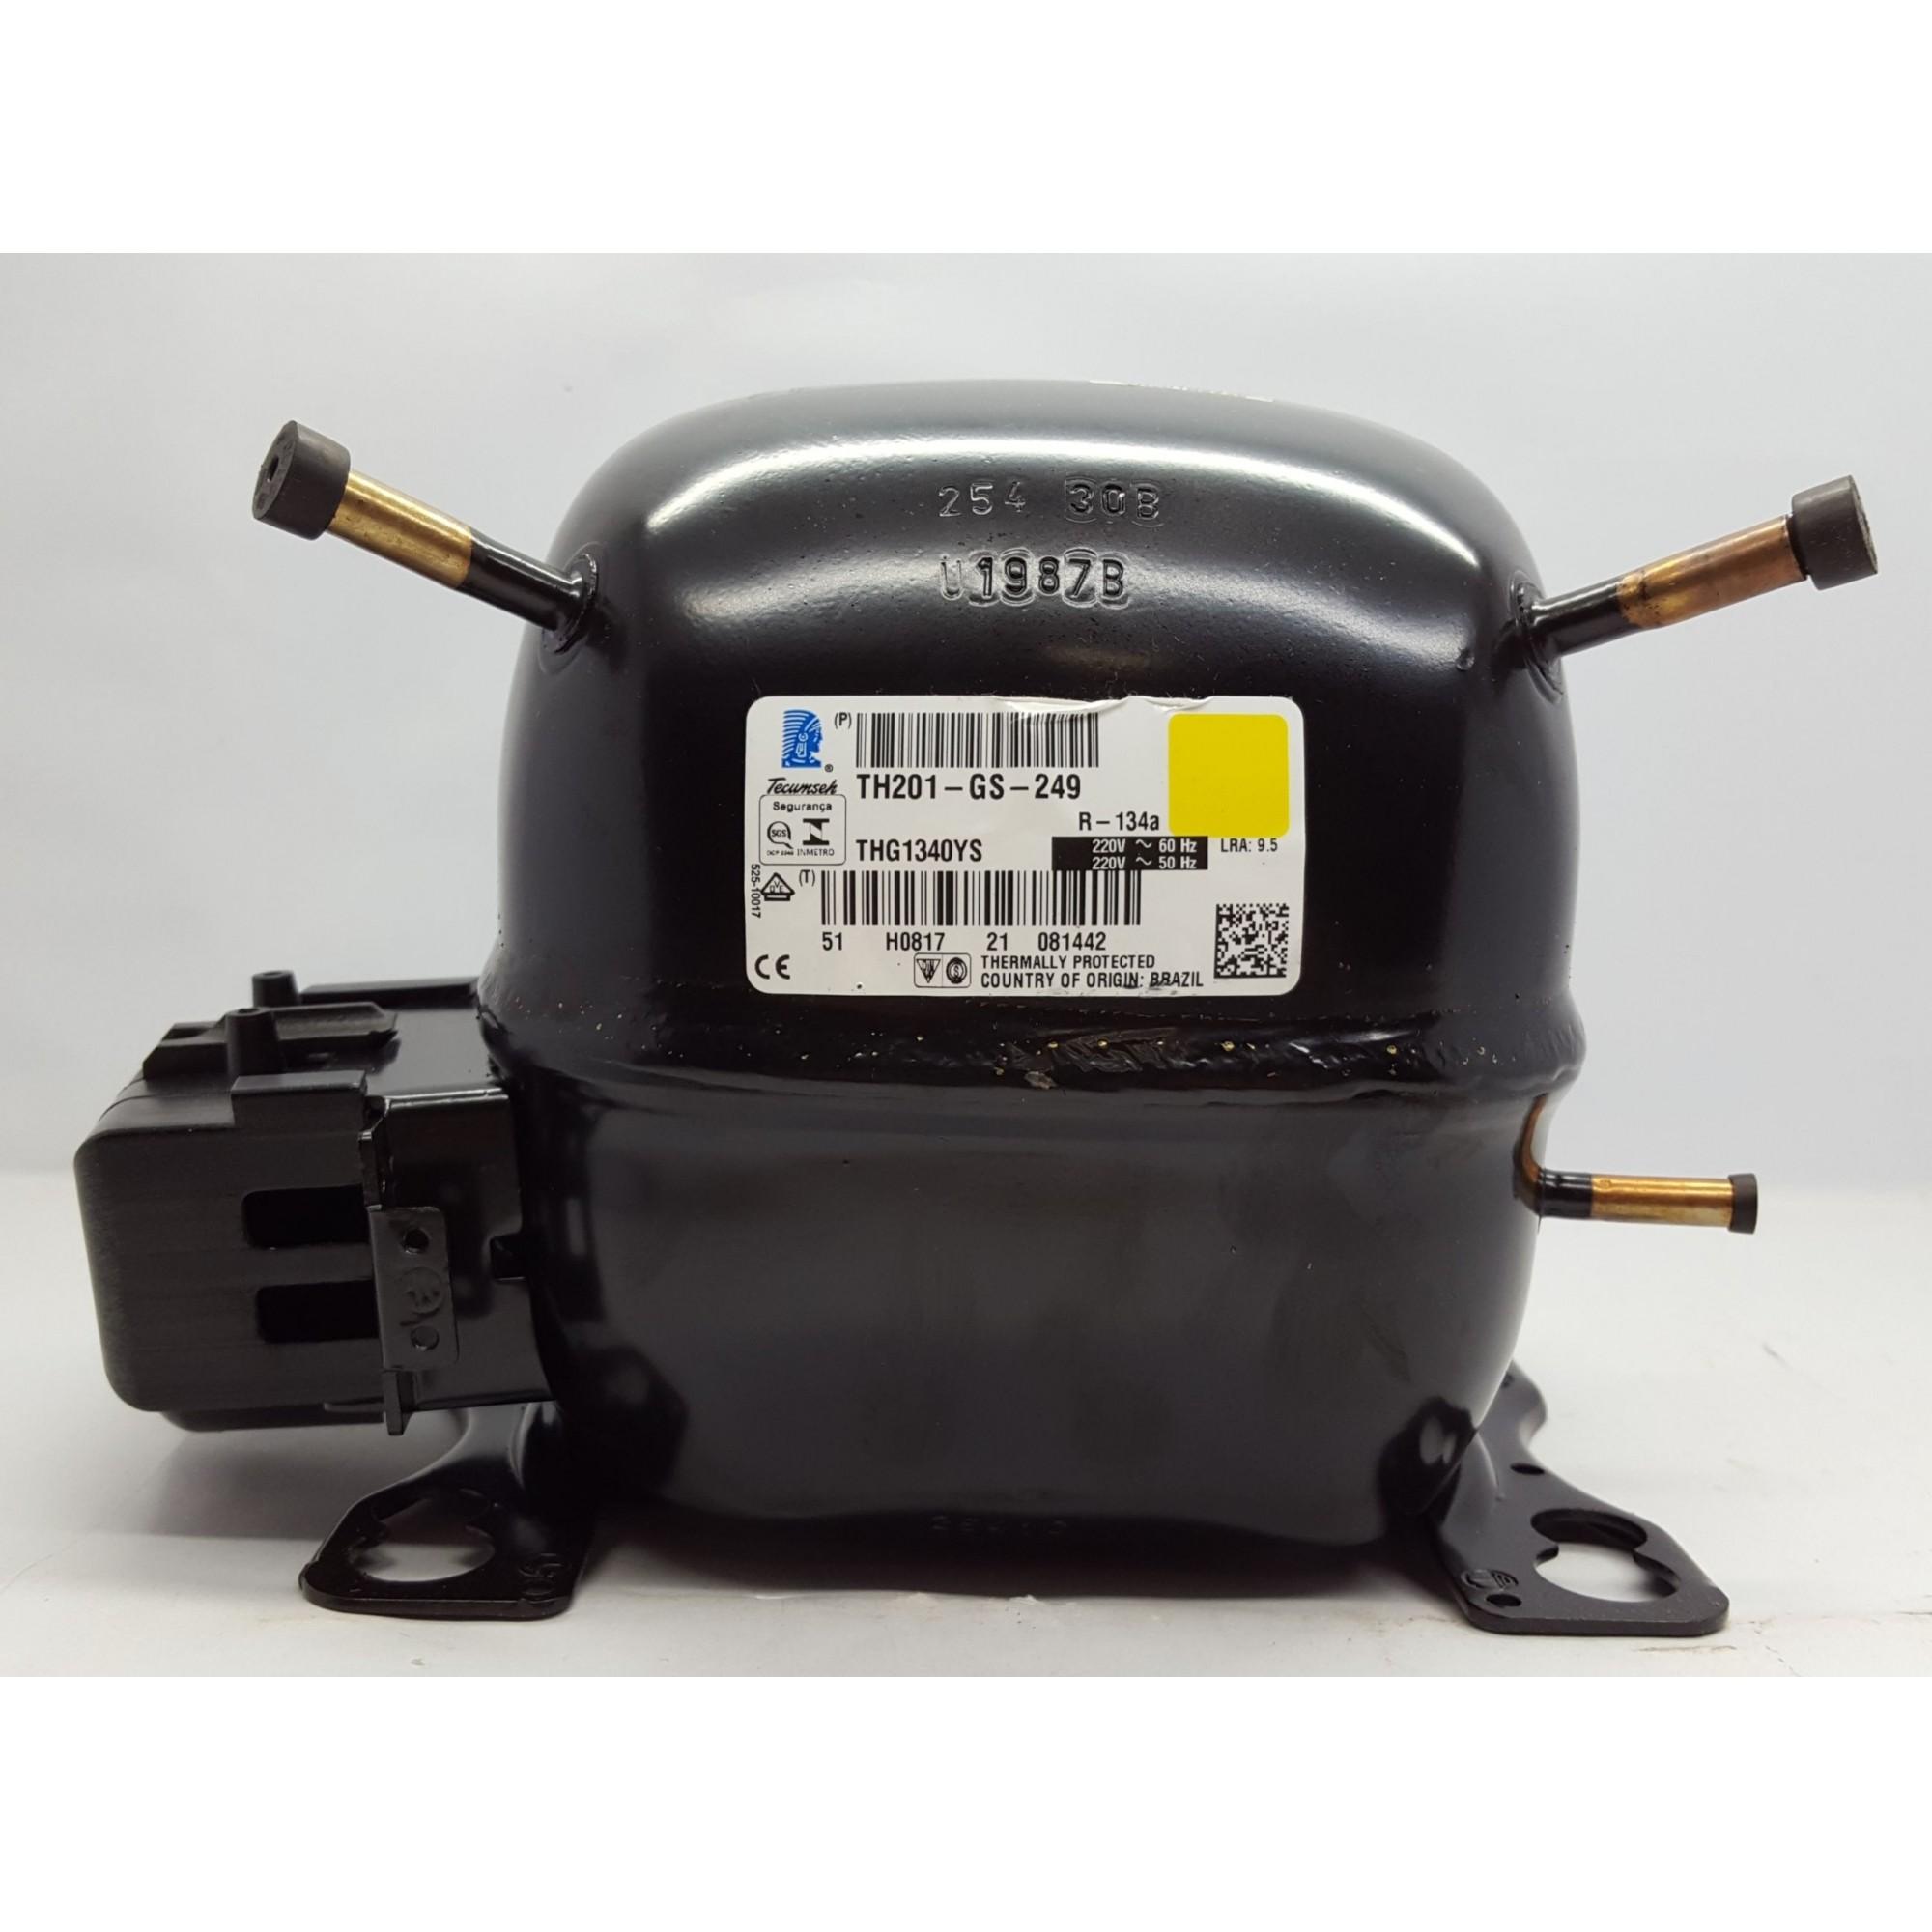 MOTOR COMPRESSOR TECUMSEH 1/8 HP - THG1340YS - R-134a (220v)